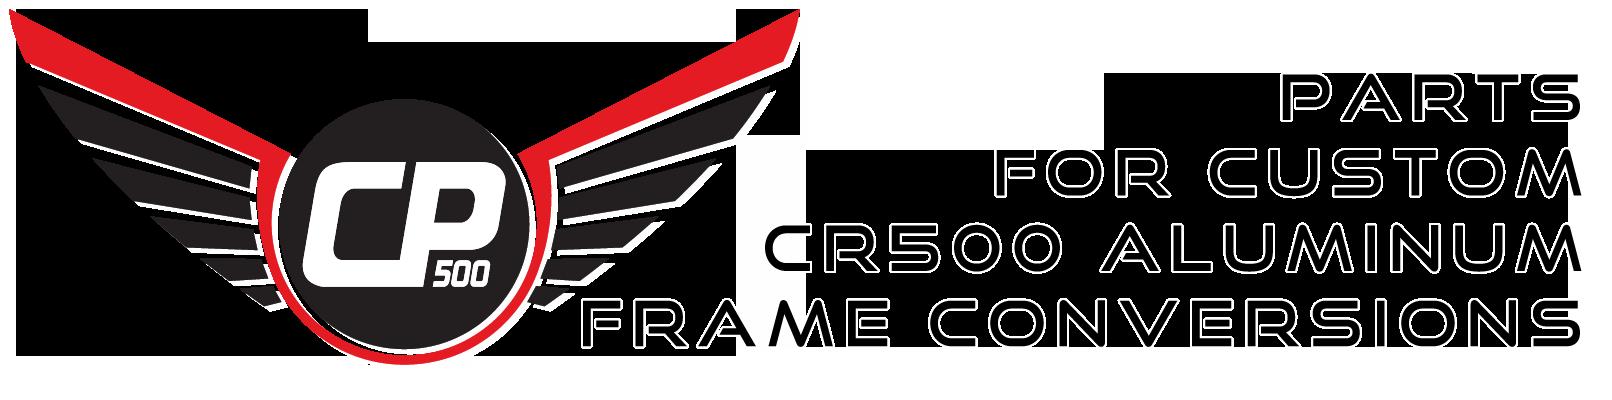 Parts for Custom CR500 Aluminum Frame Conversion ...